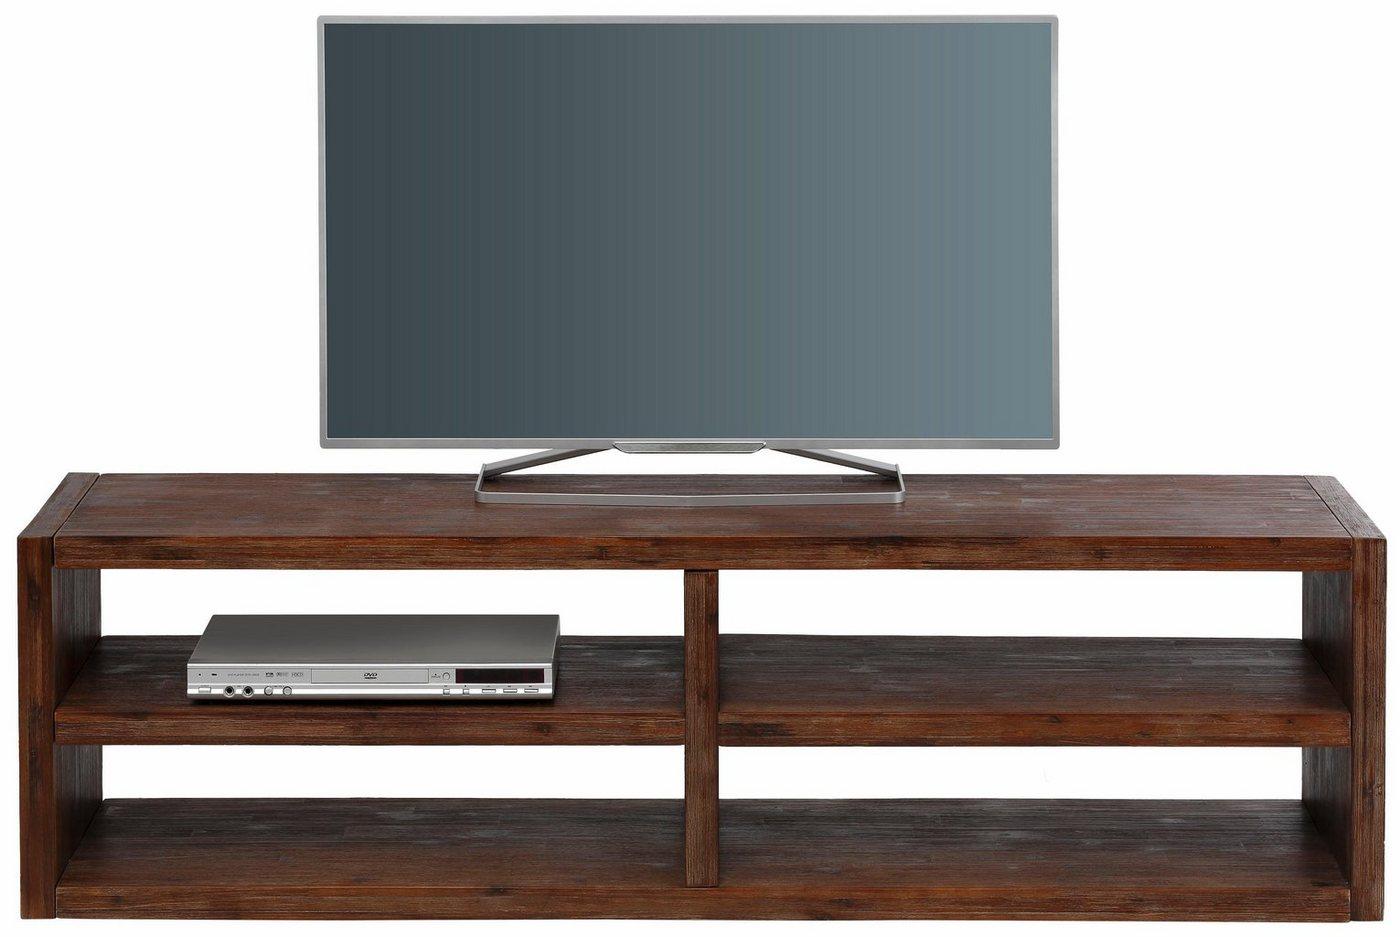 HOME AFFAIRE TV-meubel Cubes, breedte 160 cm